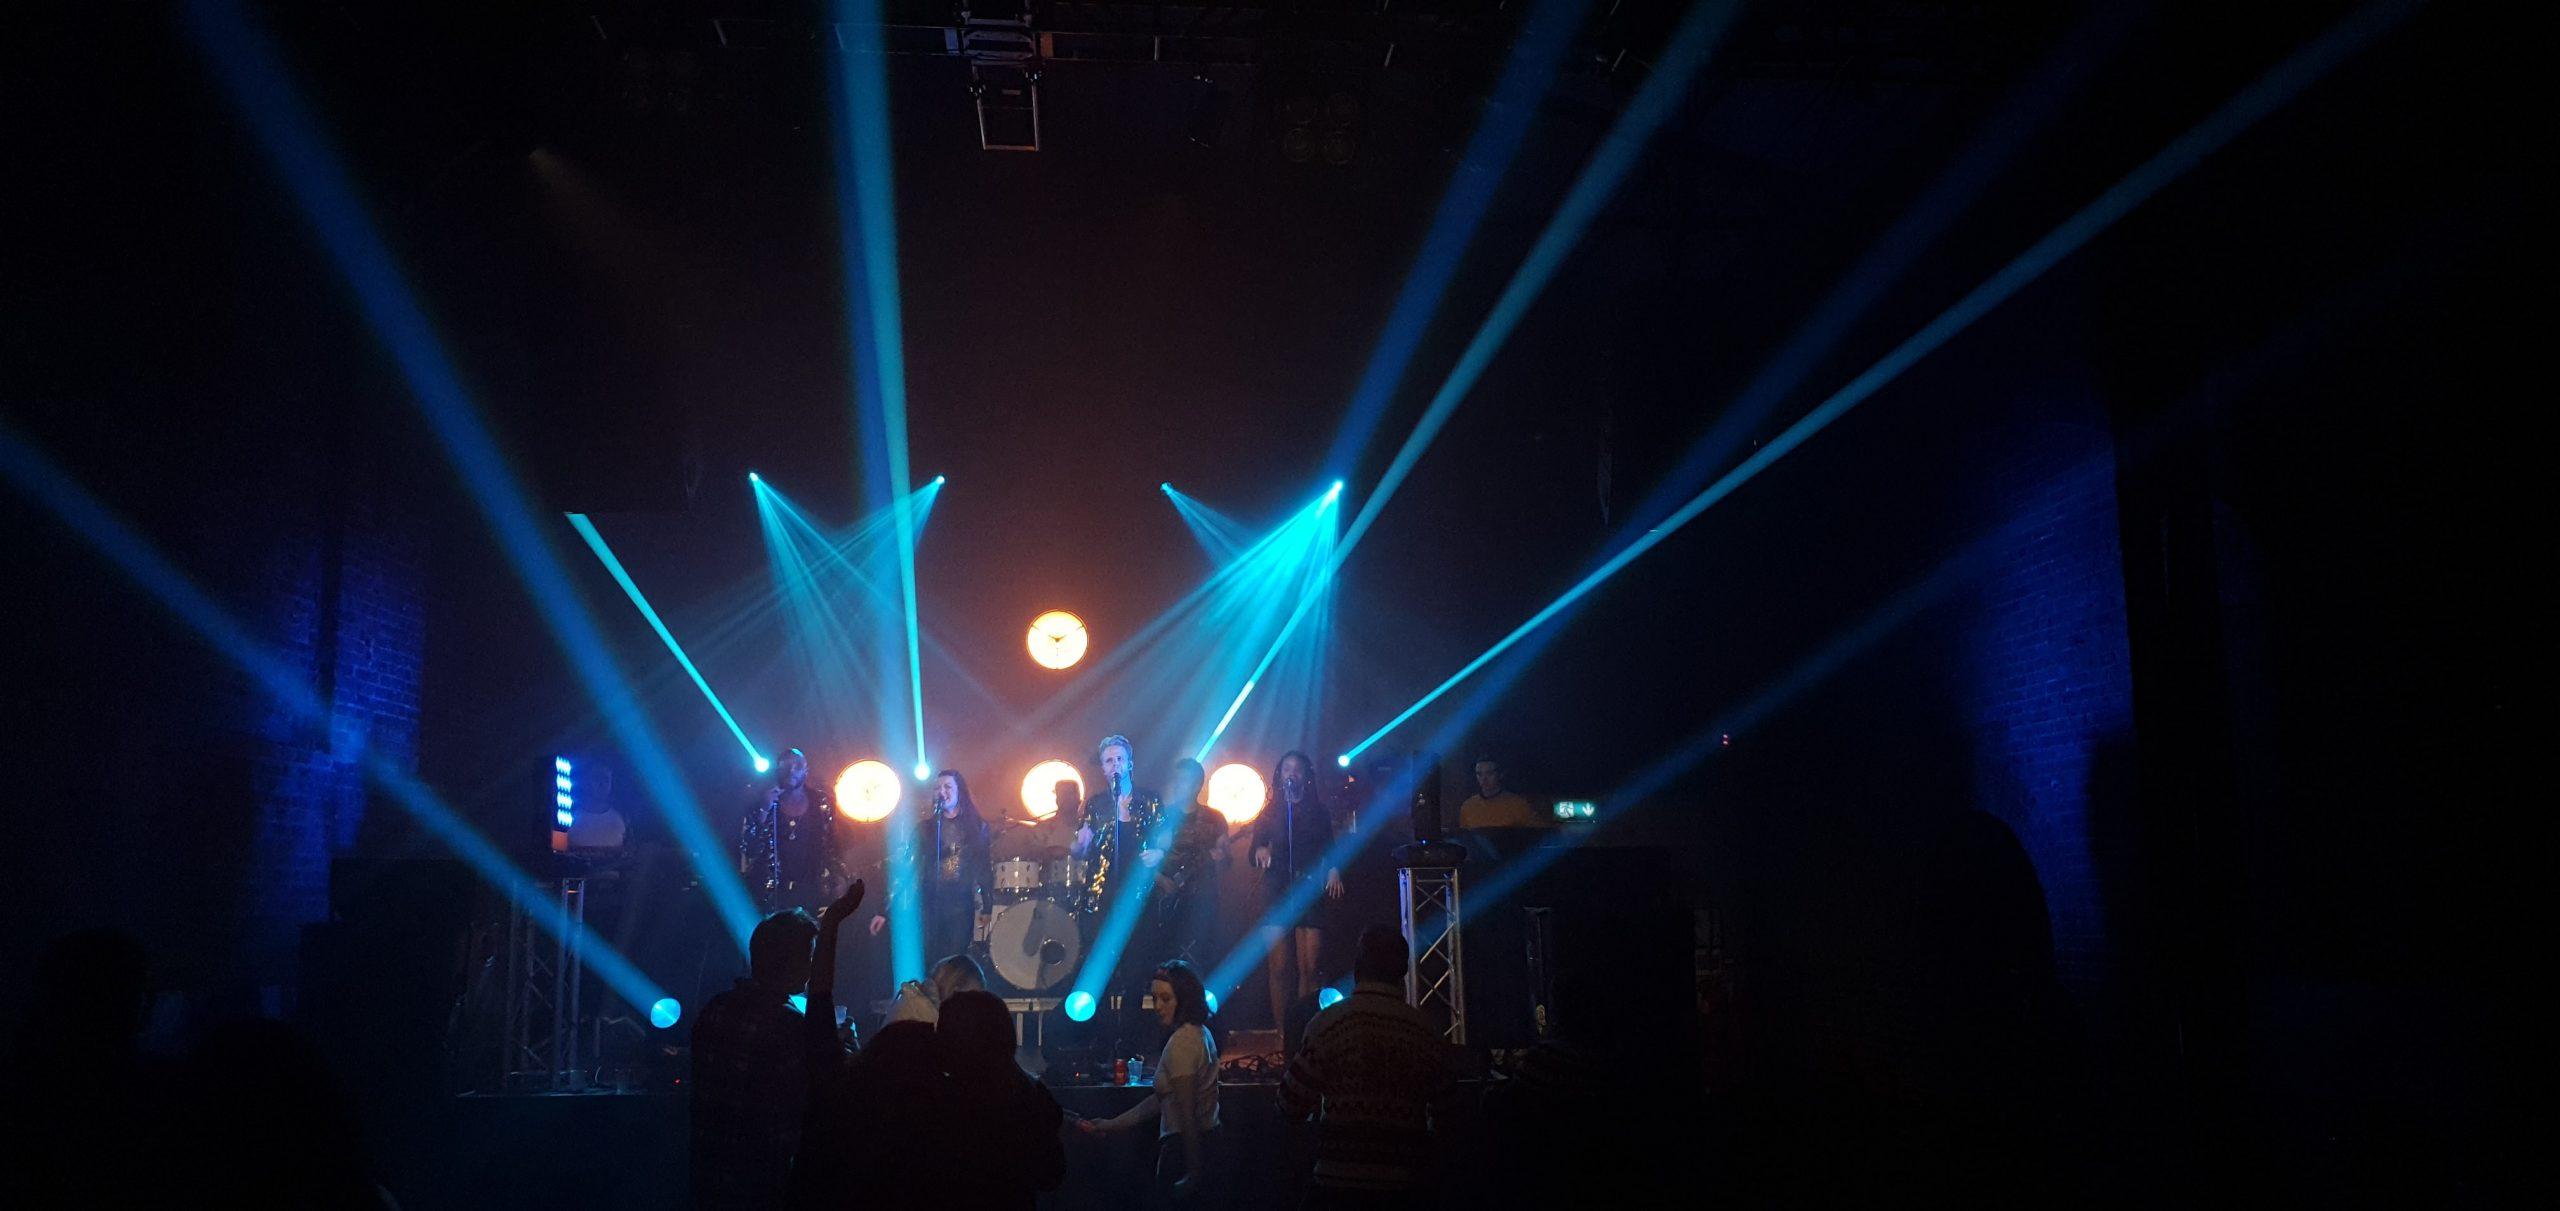 Lighting5-min